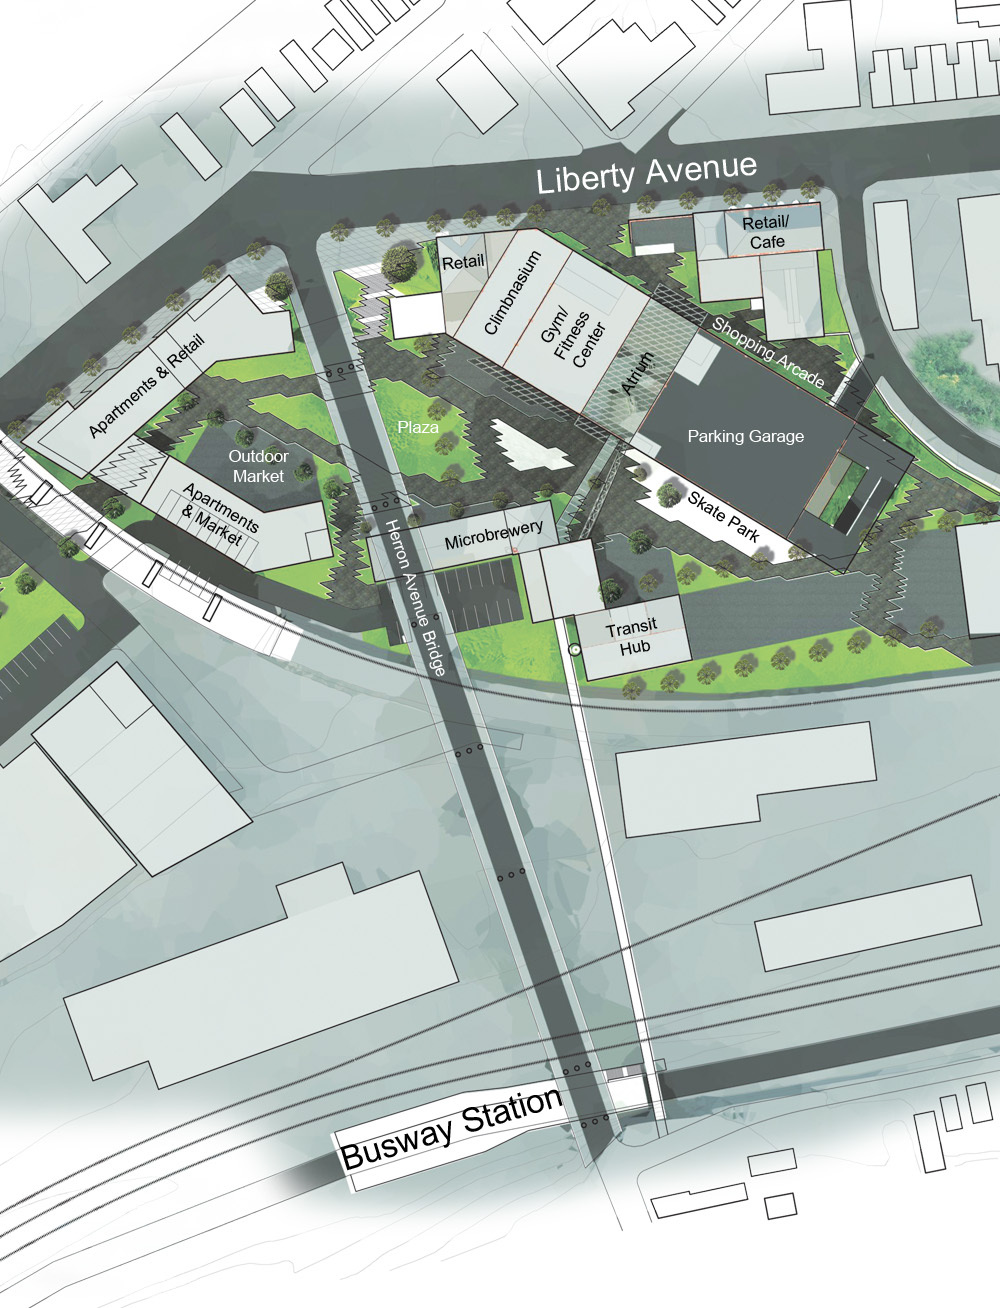 Iron City site redevelopment plan